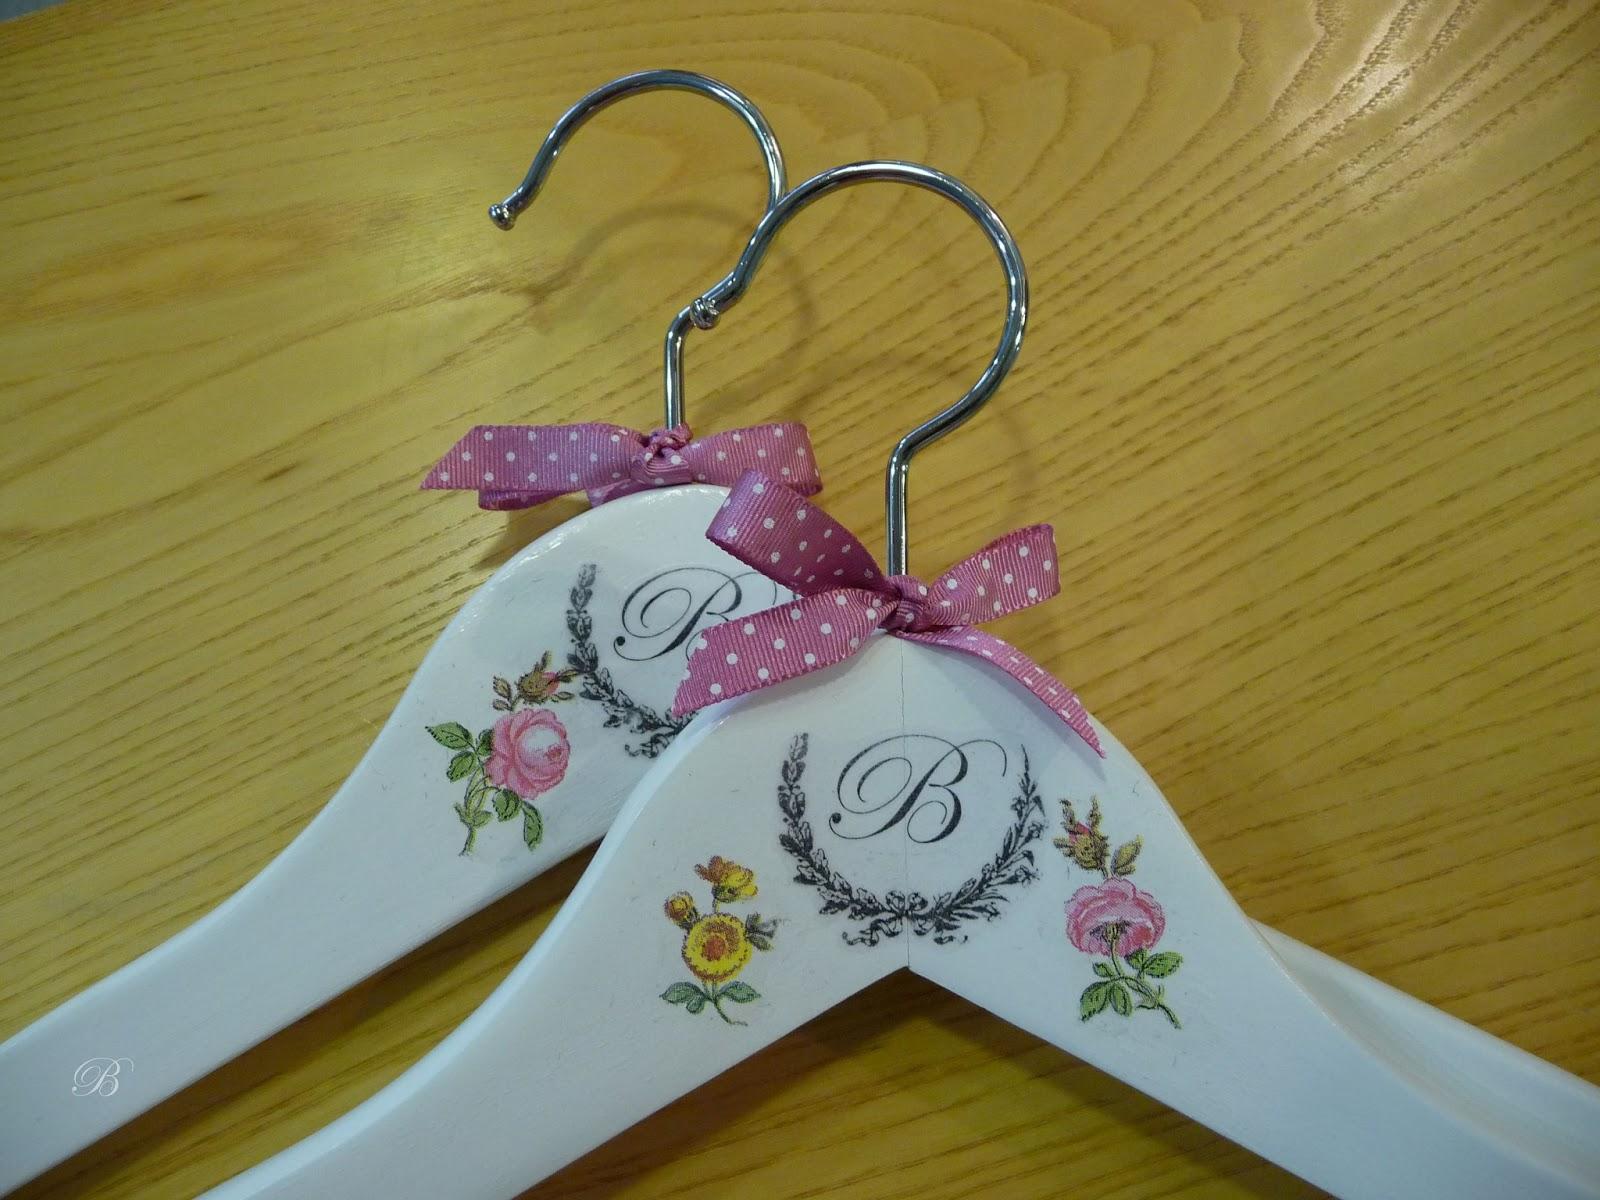 Las manualidades de blanca perchas decoradas - Perchas de madera blancas ...